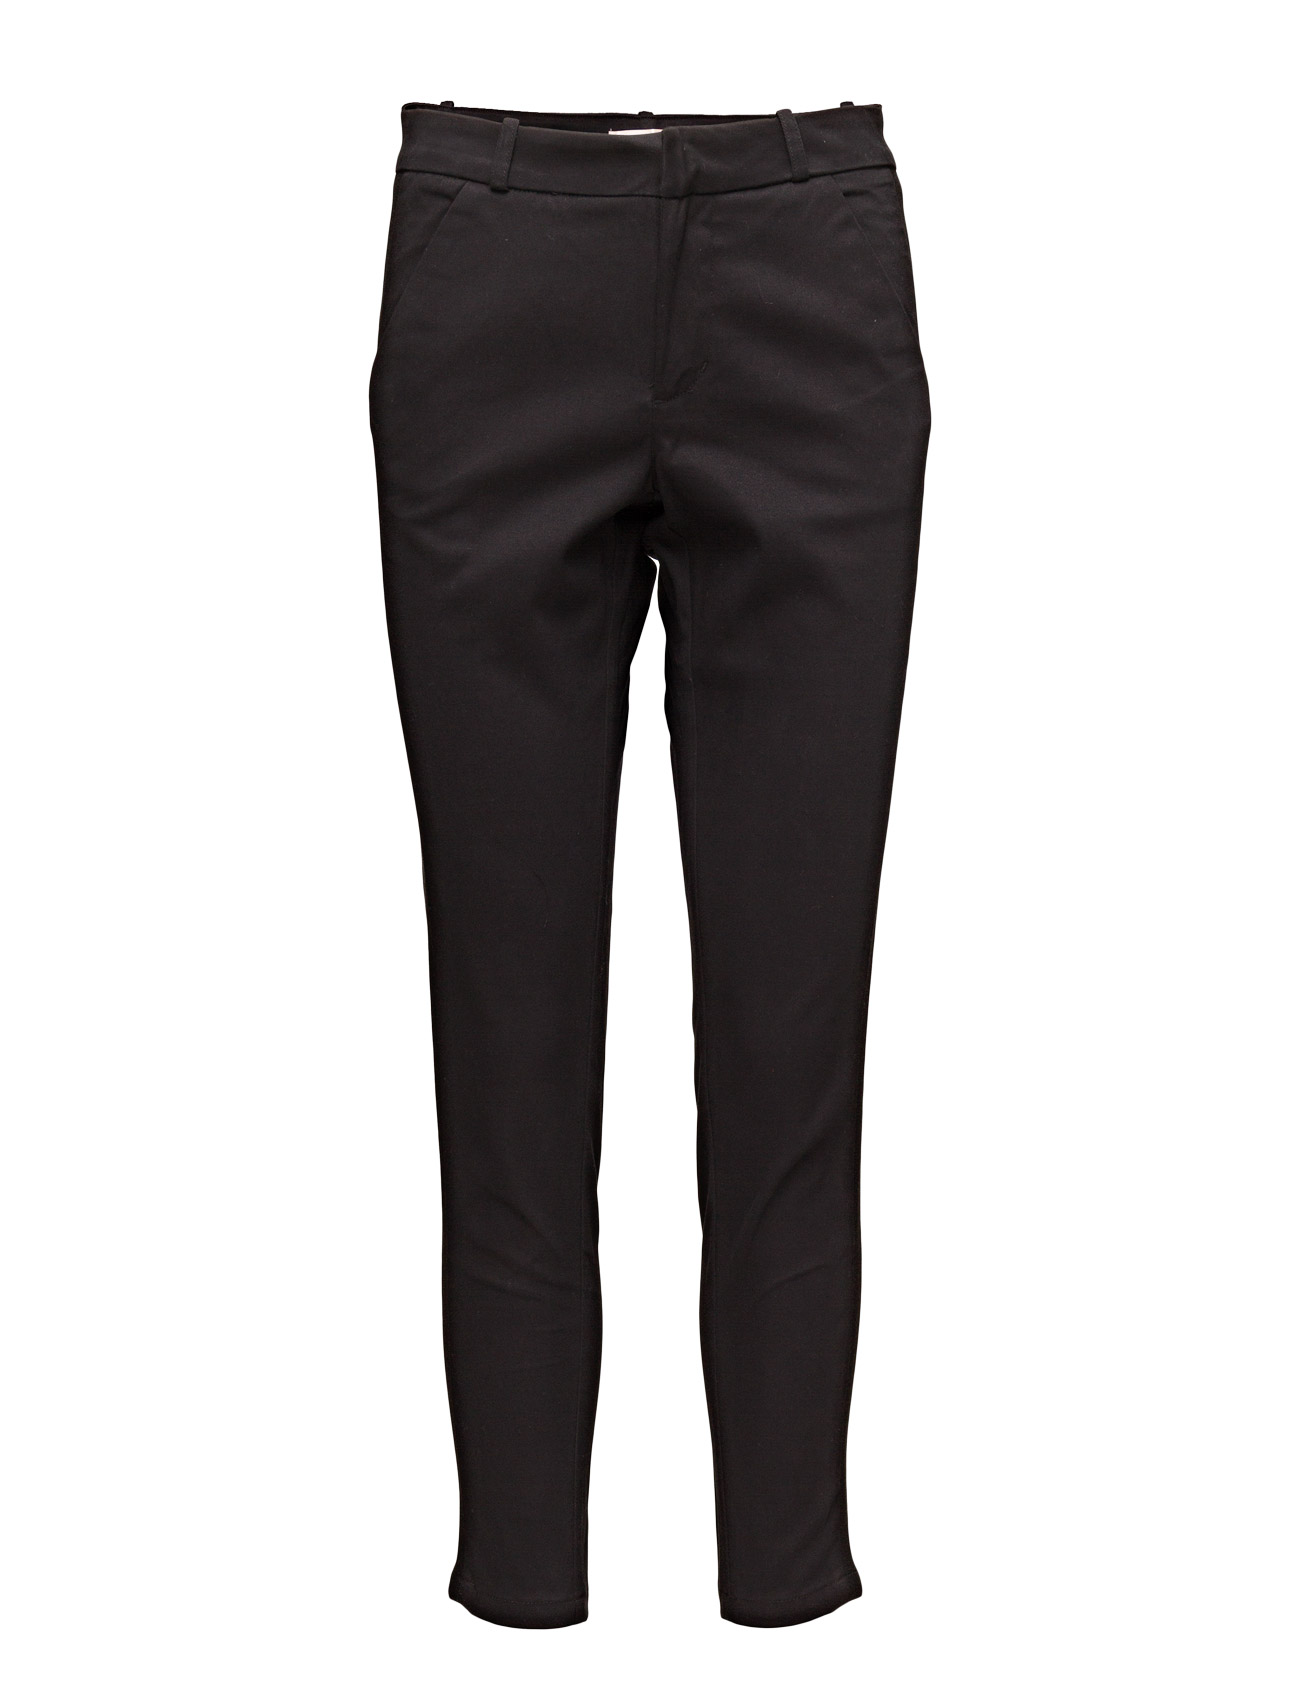 Hailey Custommade Bukser til Kvinder i Antracit sort